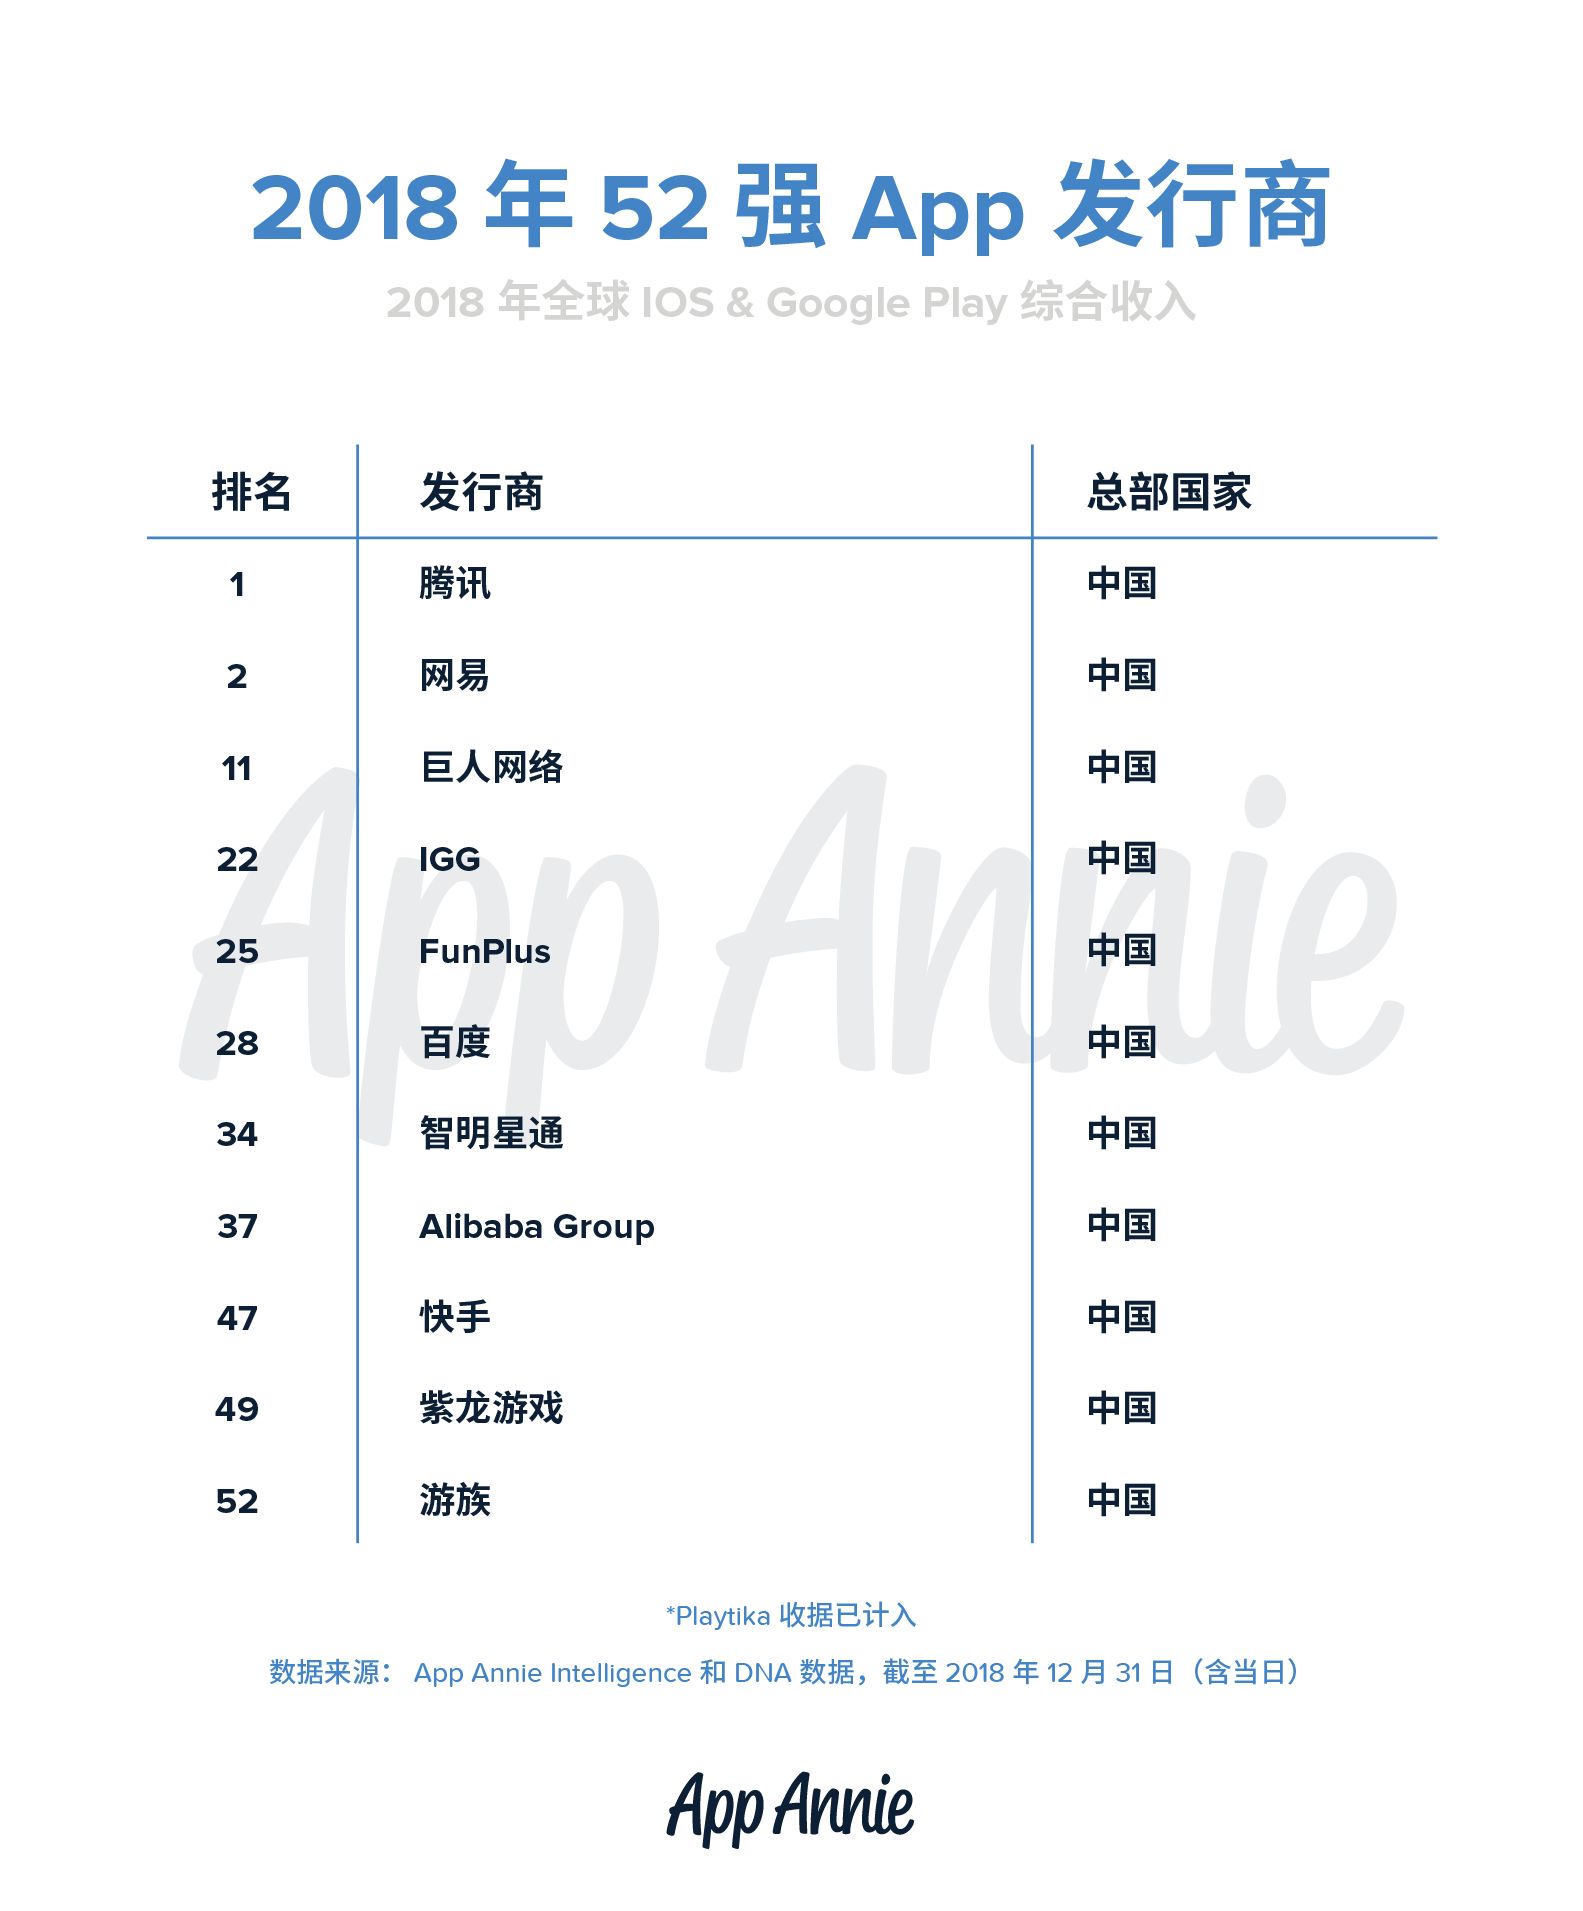 App Annie发布2018年52强发行商榜单:腾讯网易前二